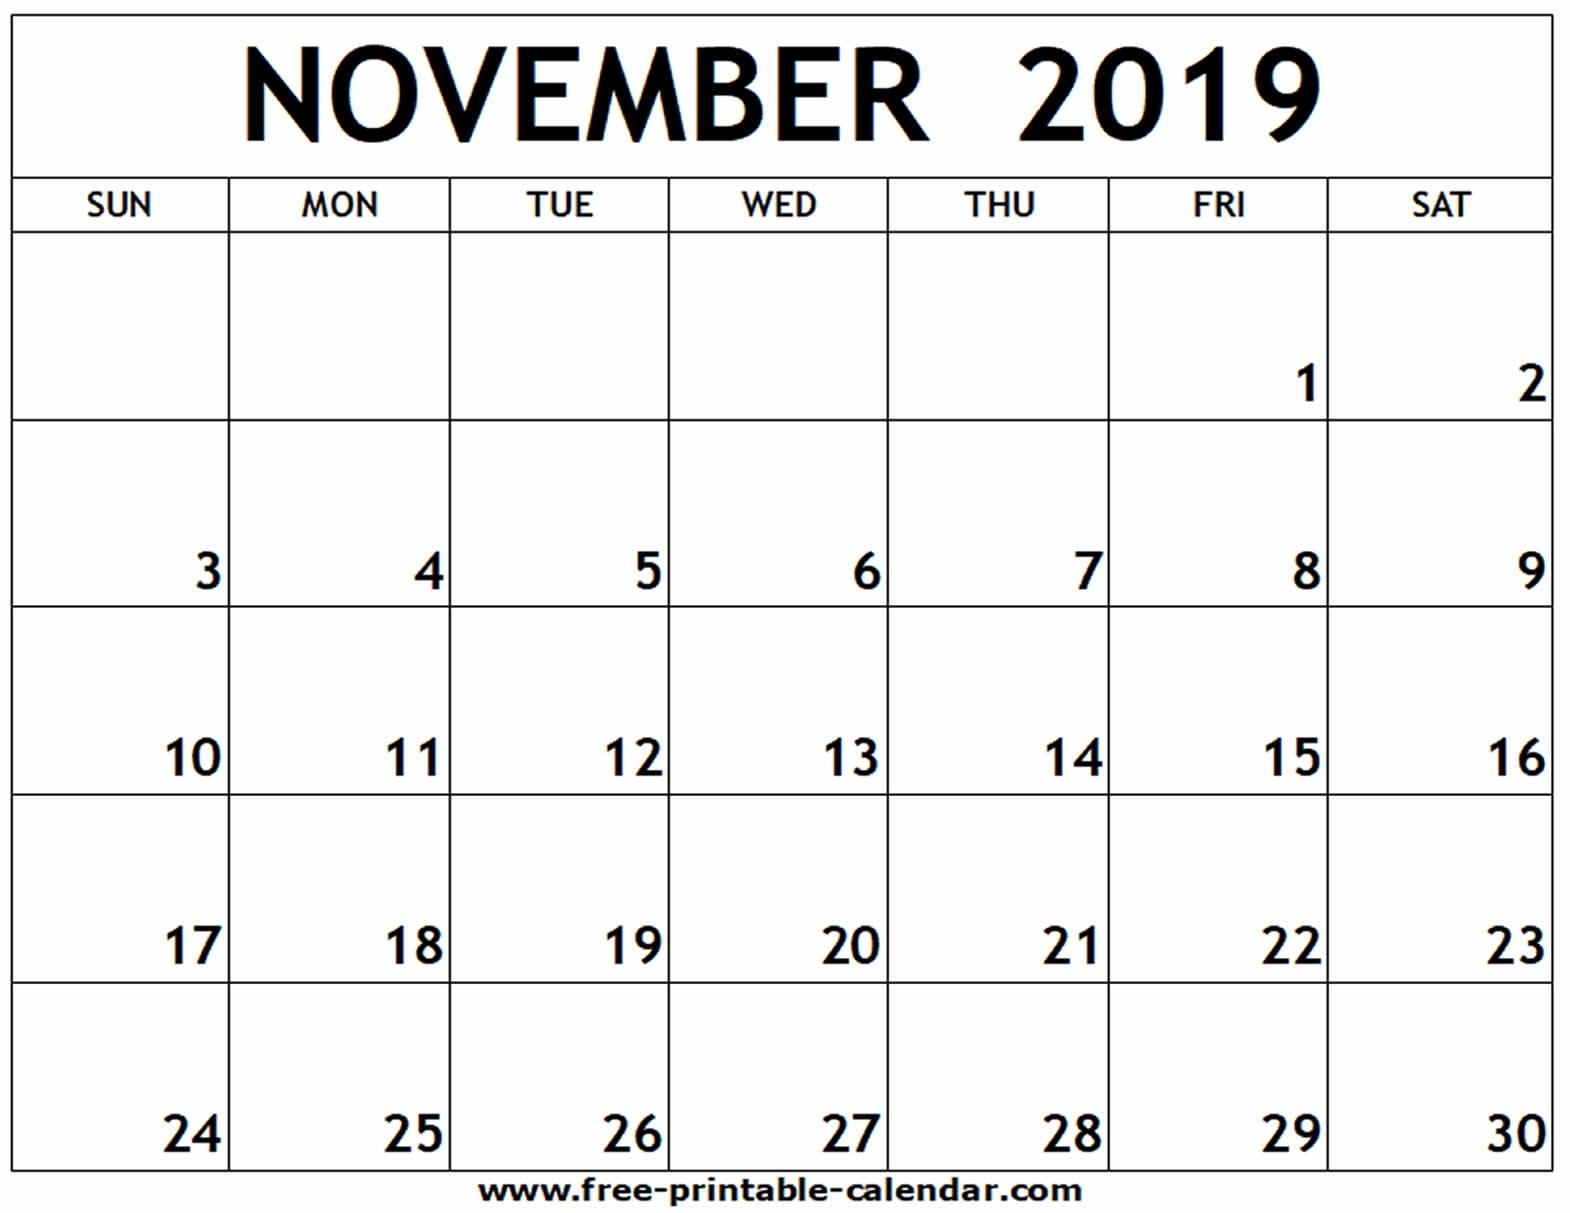 November 2019 Printable Calendar - Free-Printable-Calendar